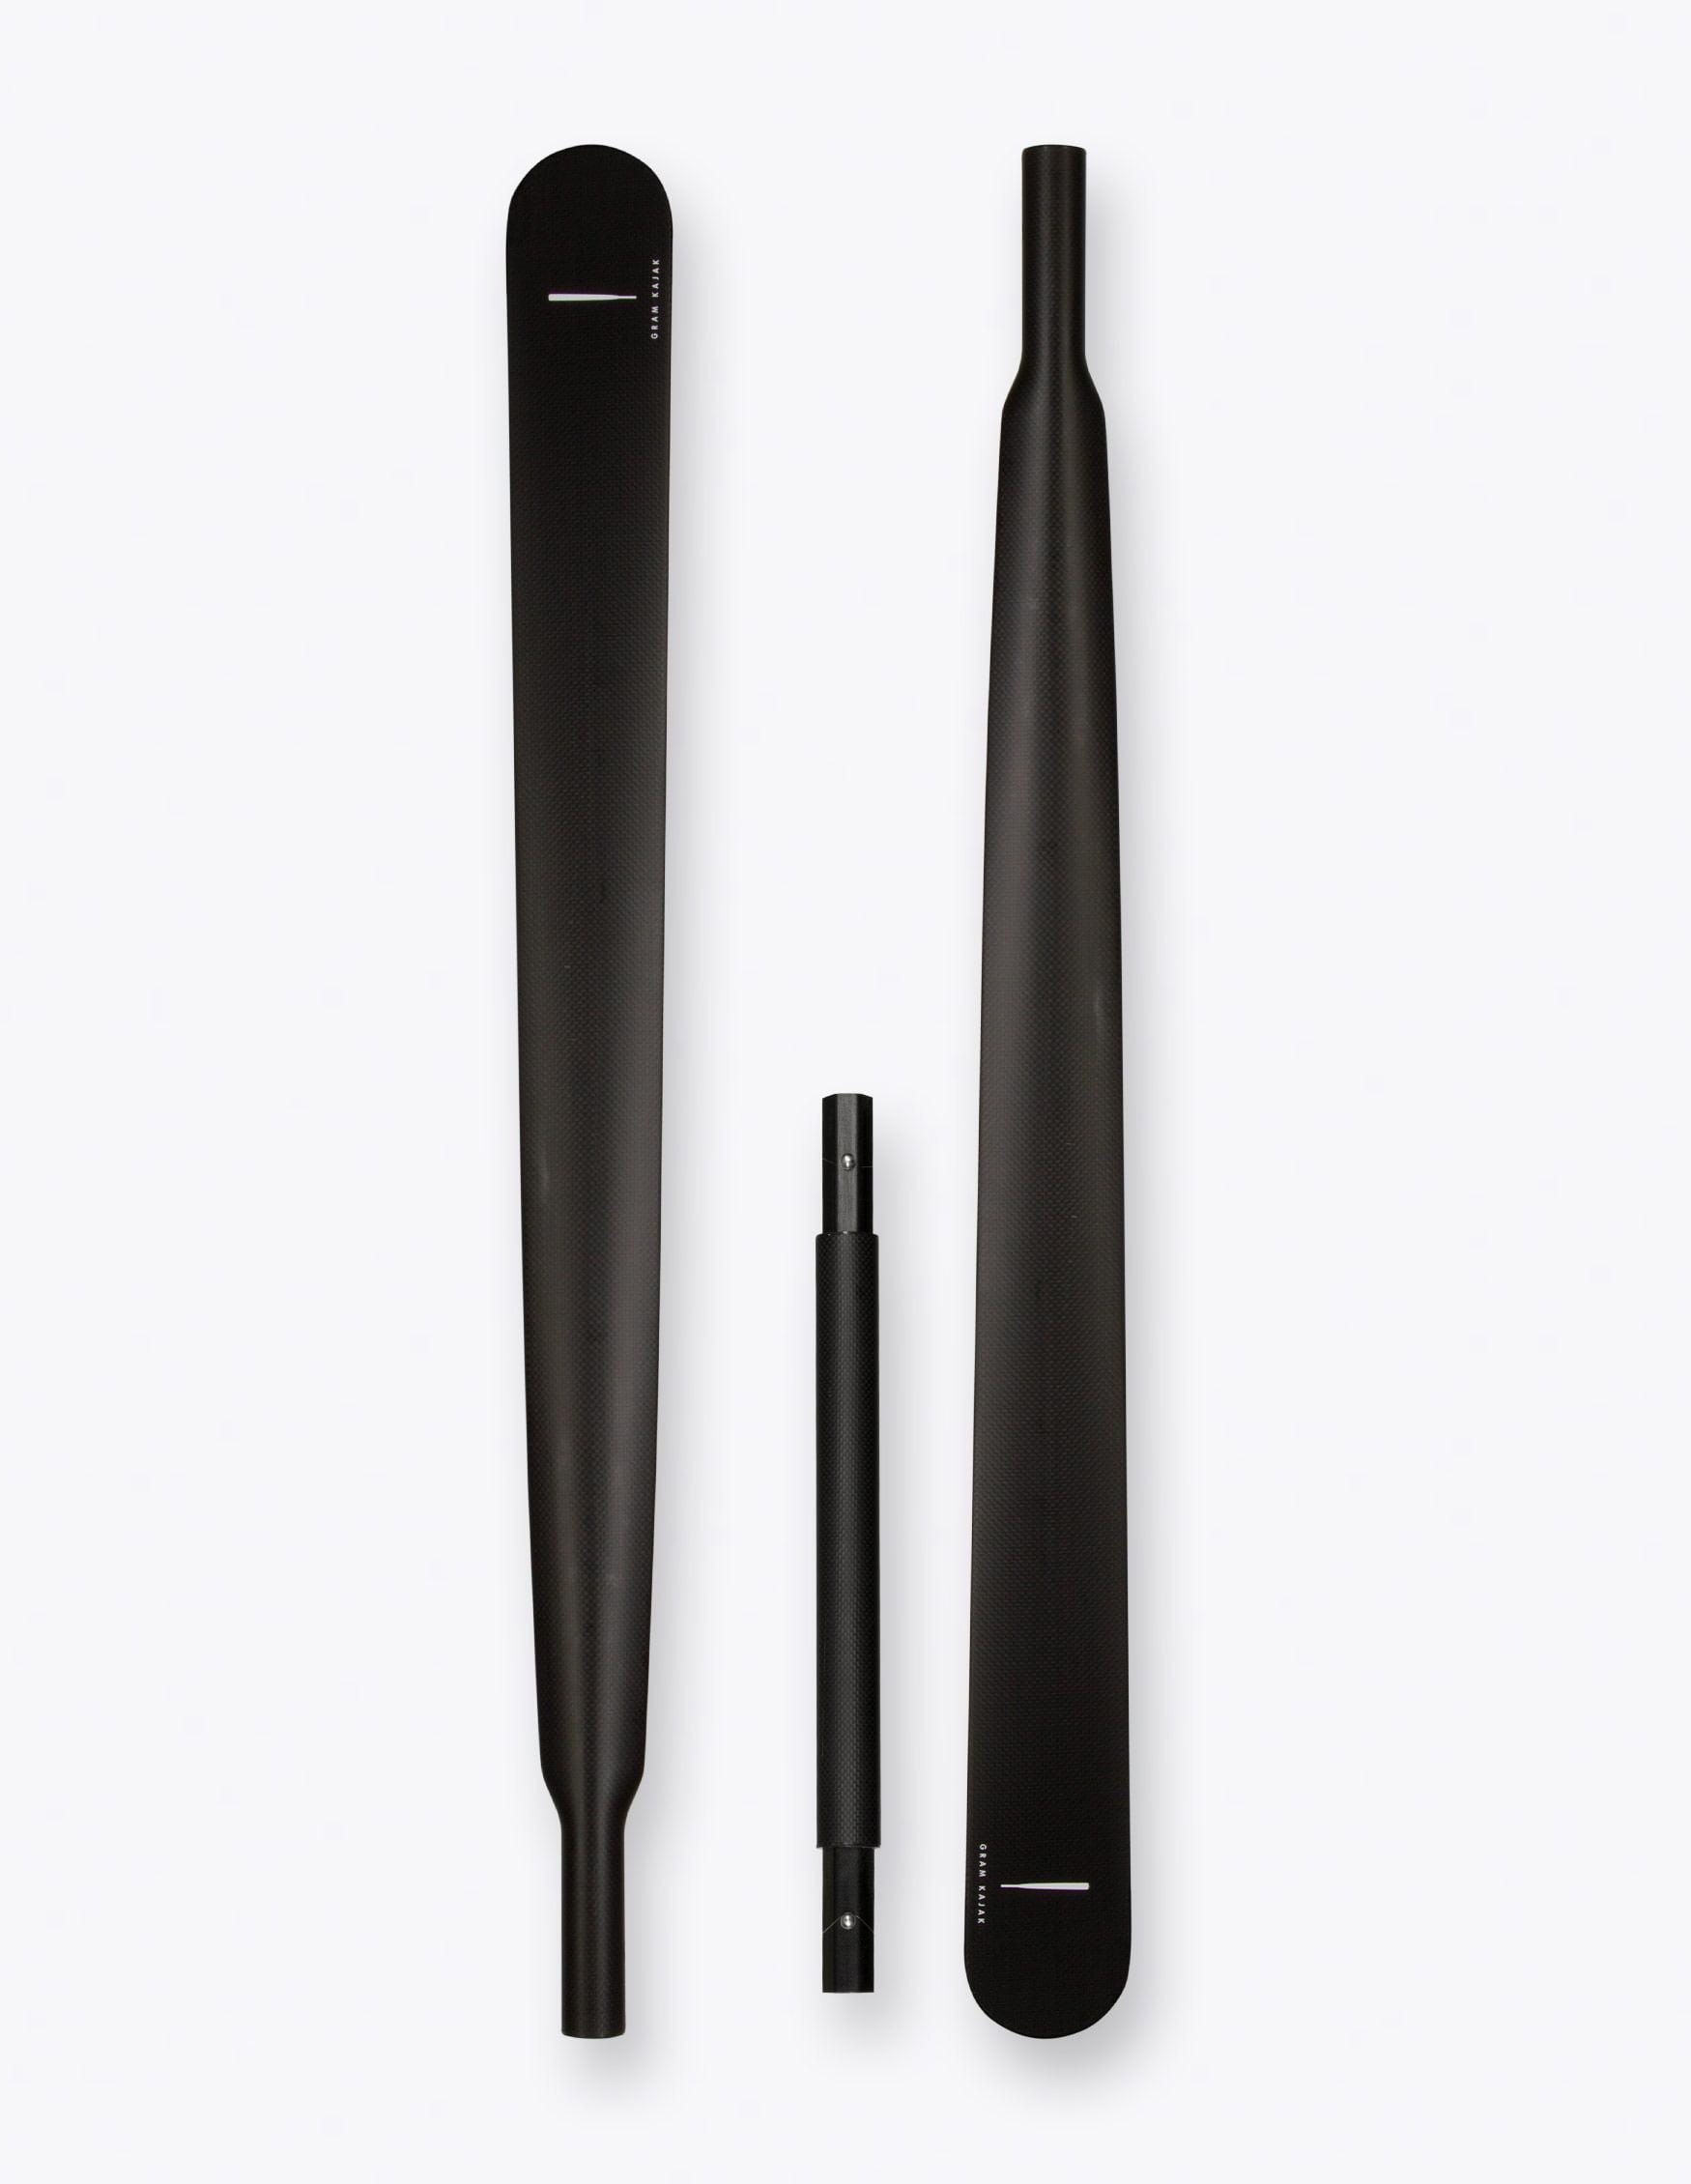 Carbon paddle